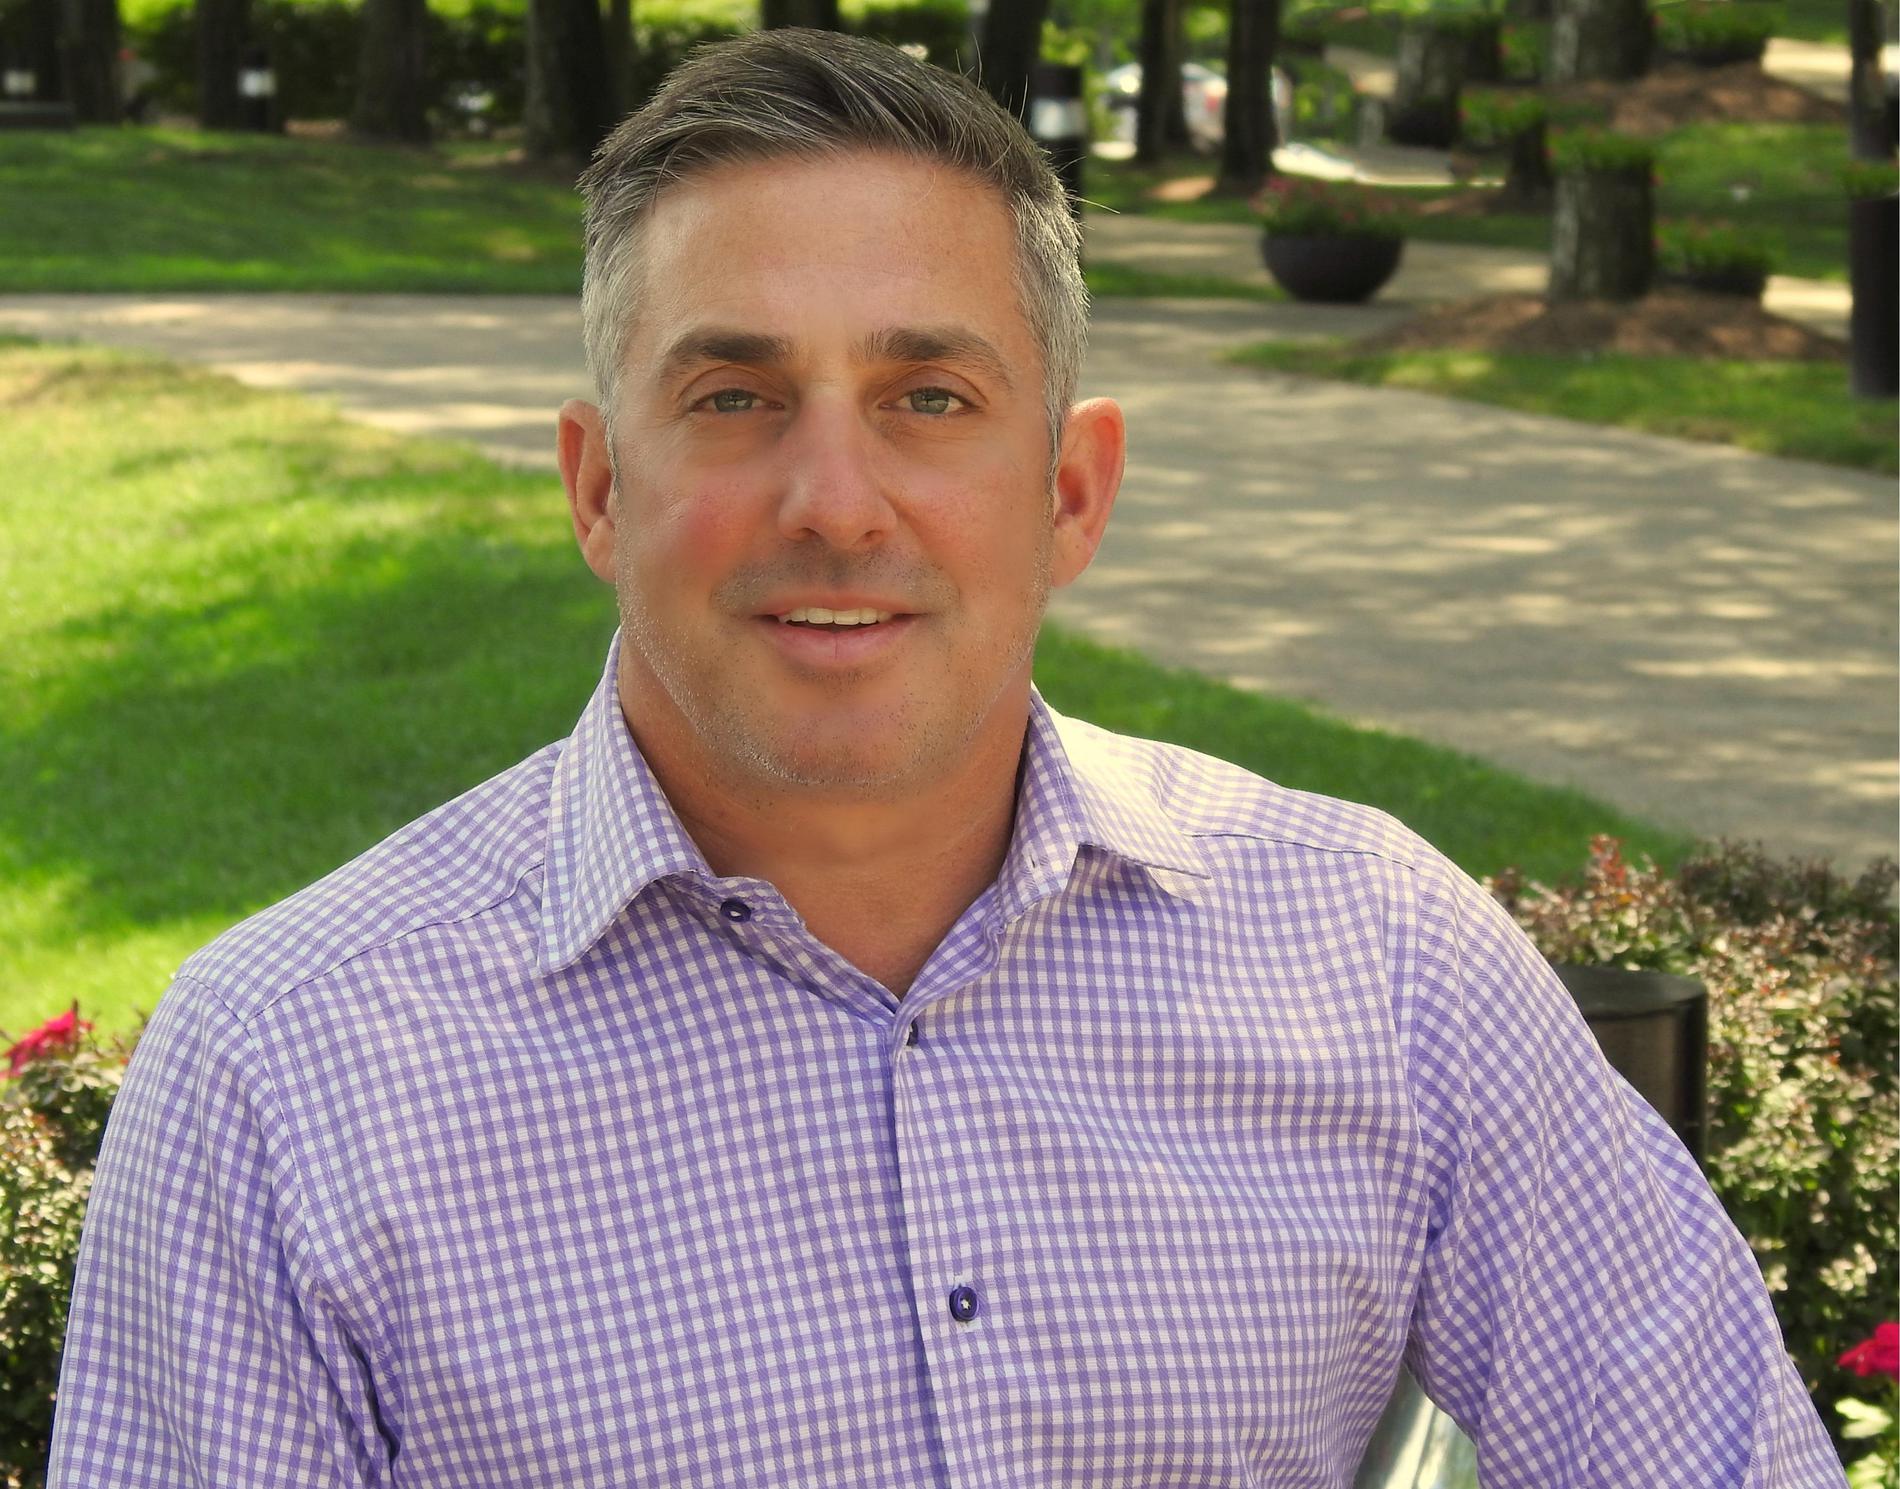 Edmund Iannelli | Paramus, NJ | Morgan Stanley Wealth Management